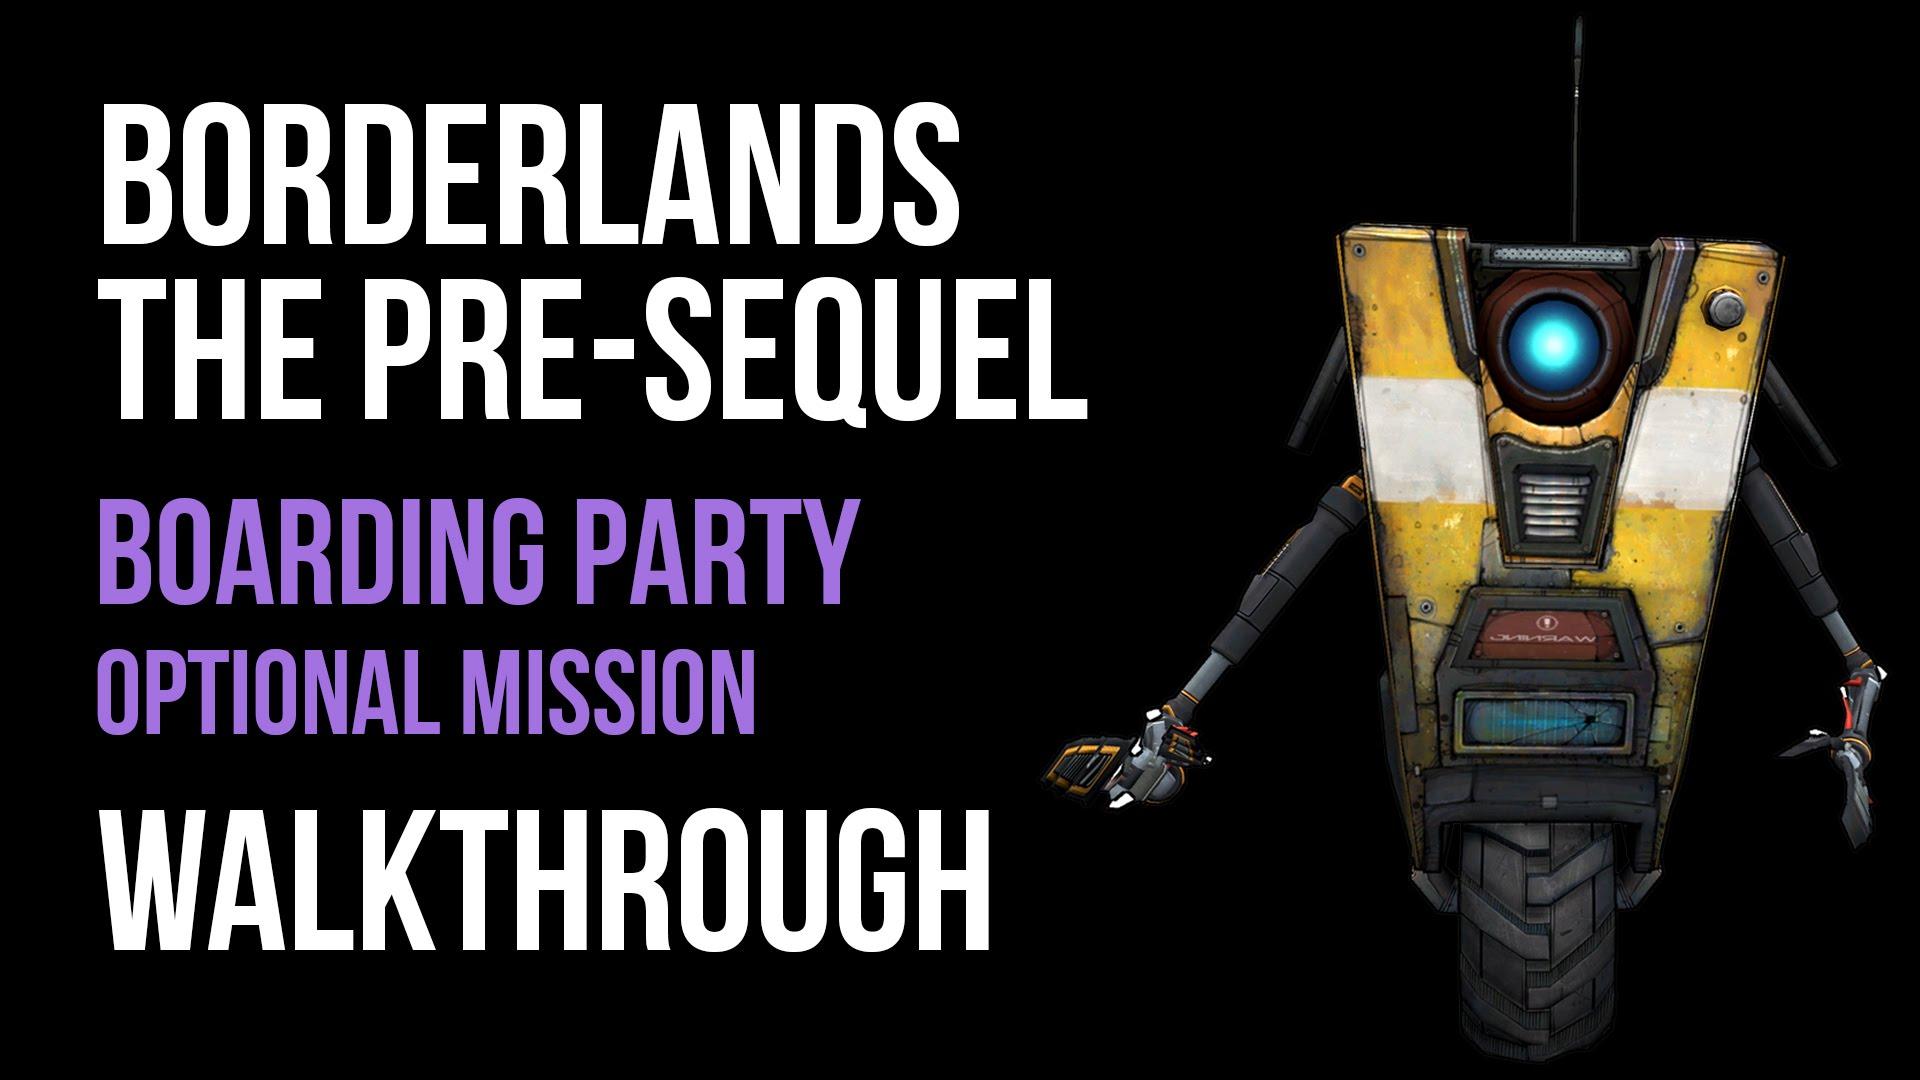 Borderlands The Pre-Sequel Boarding Party Walkthrough - Video Games, Wikis,  Cheats, Walkthroughs, Reviews, News & Videos